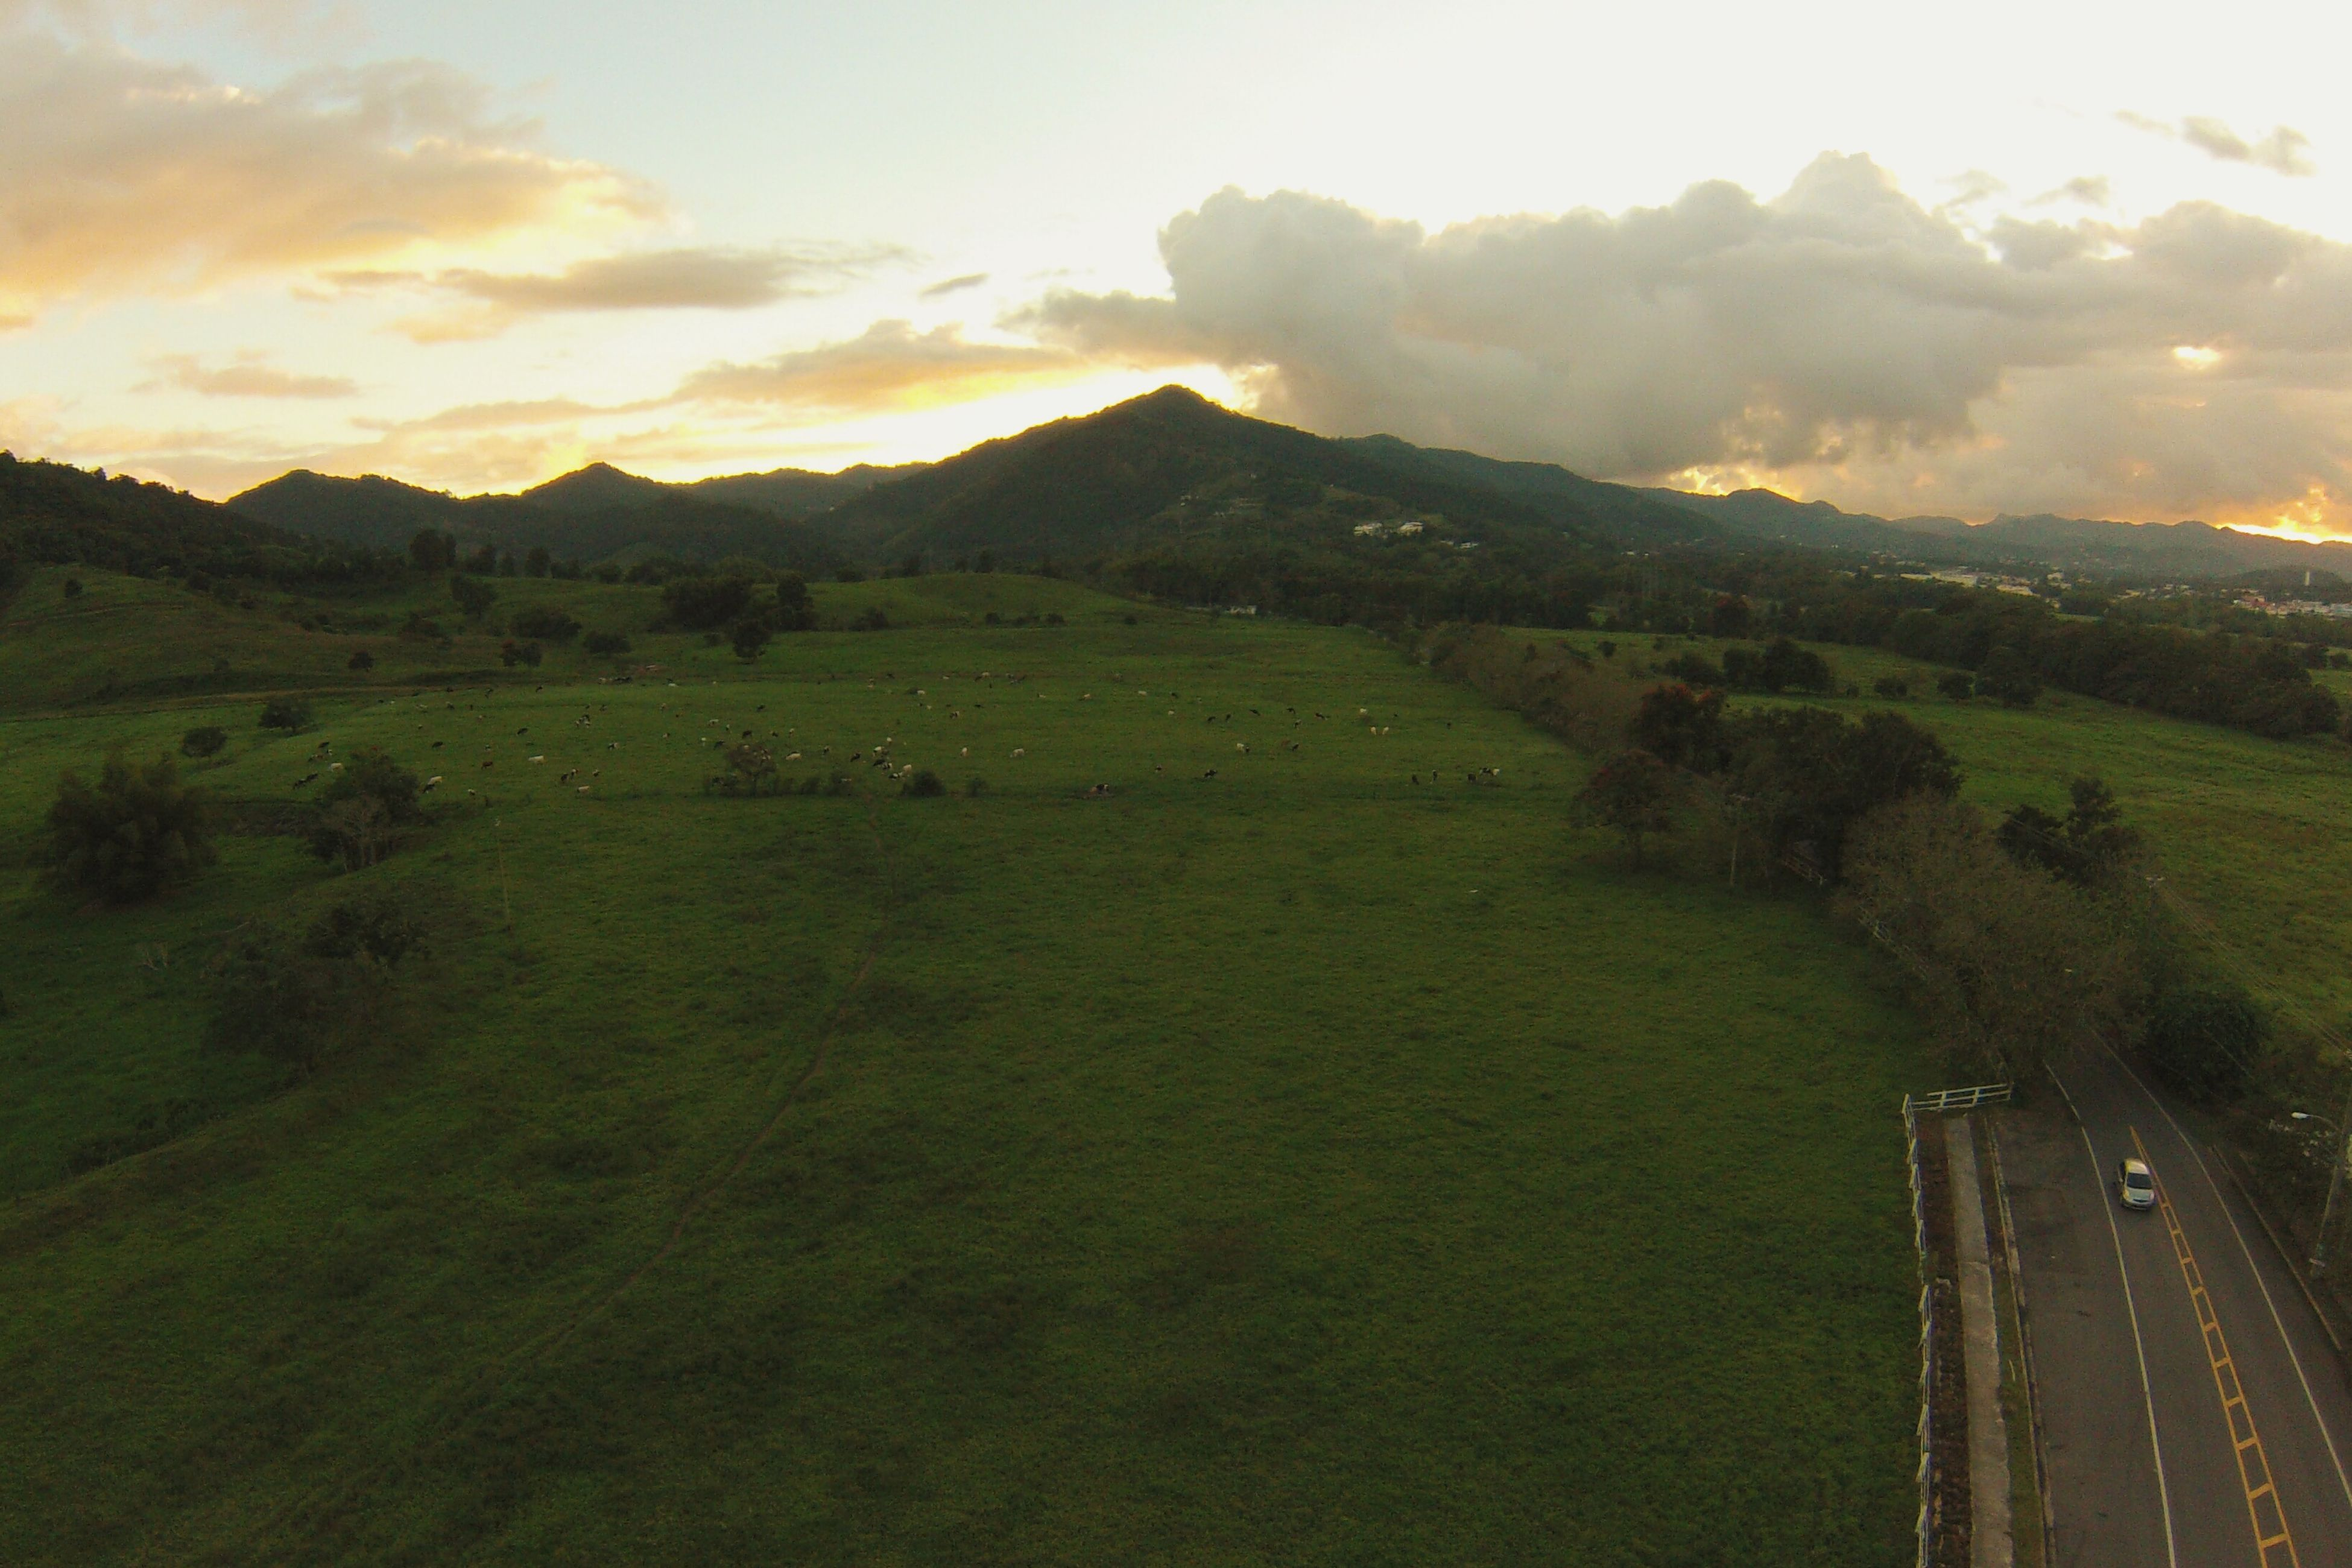 mountain, landscape, tranquil scene, scenics, tranquility, beauty in nature, mountain range, sky, nature, grass, field, sunset, idyllic, non-urban scene, green color, rural scene, hill, tree, remote, cloud - sky